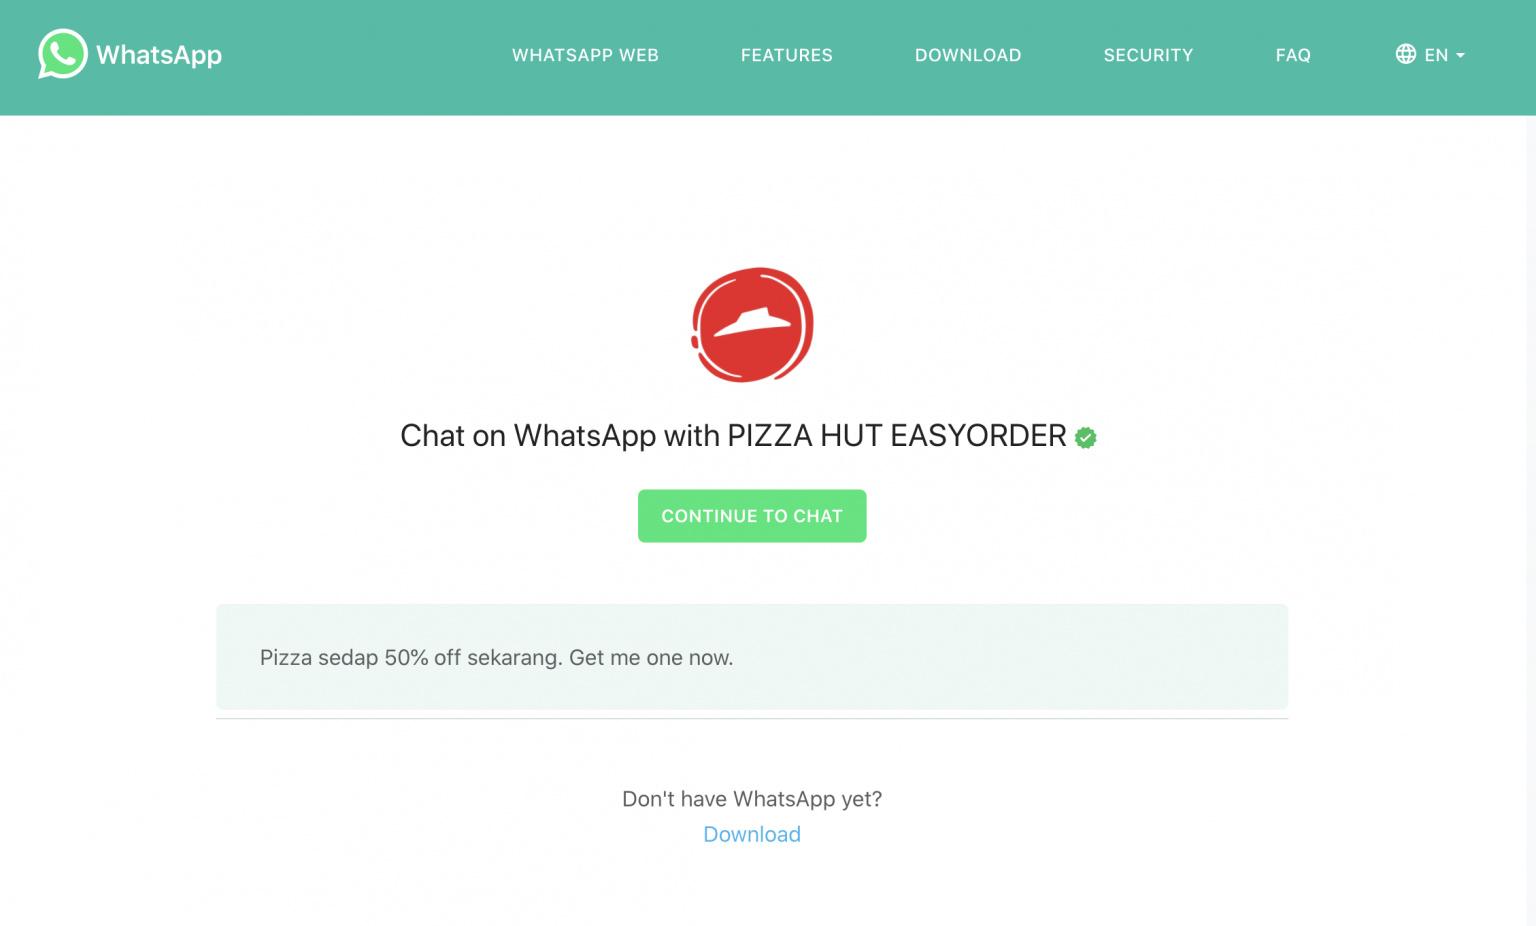 whatsapp-pizza-hut